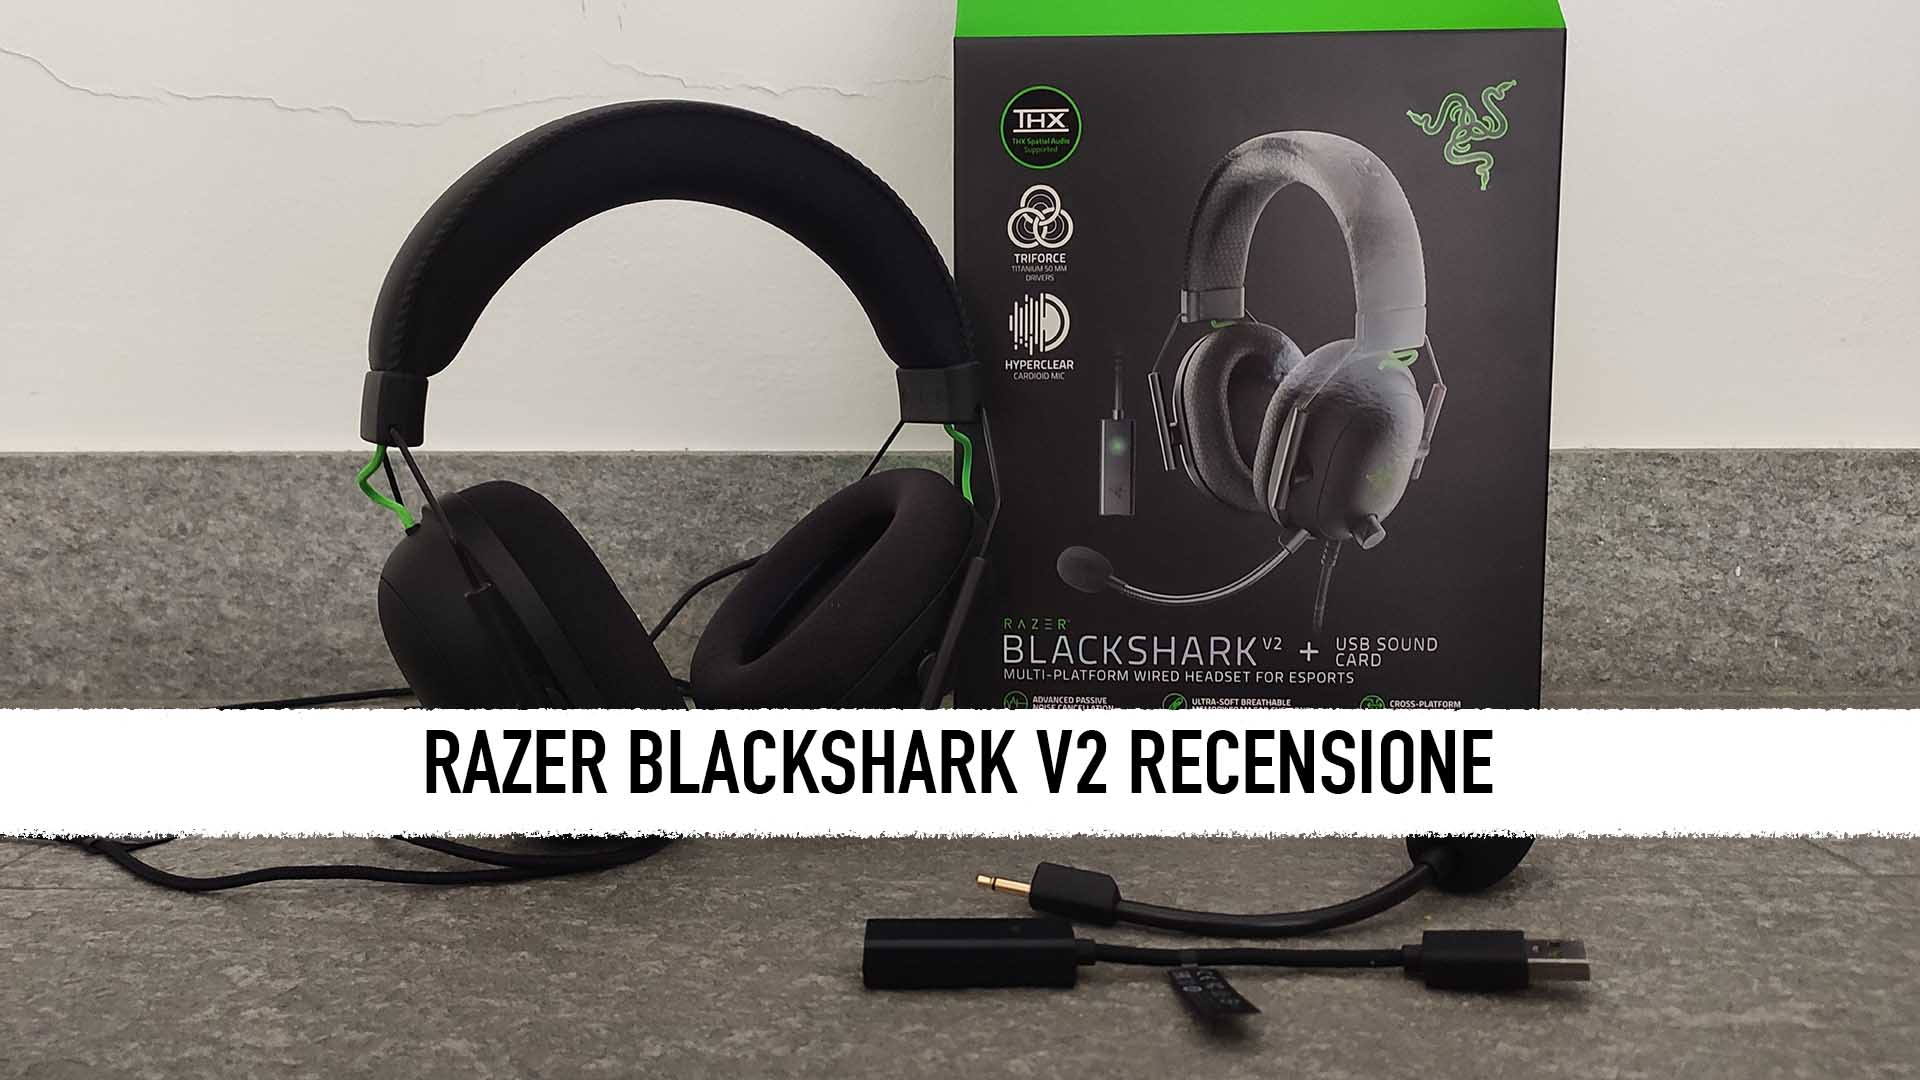 Razer Blackshark V2: recensione - Le cuffie per l'eSport thumbnail